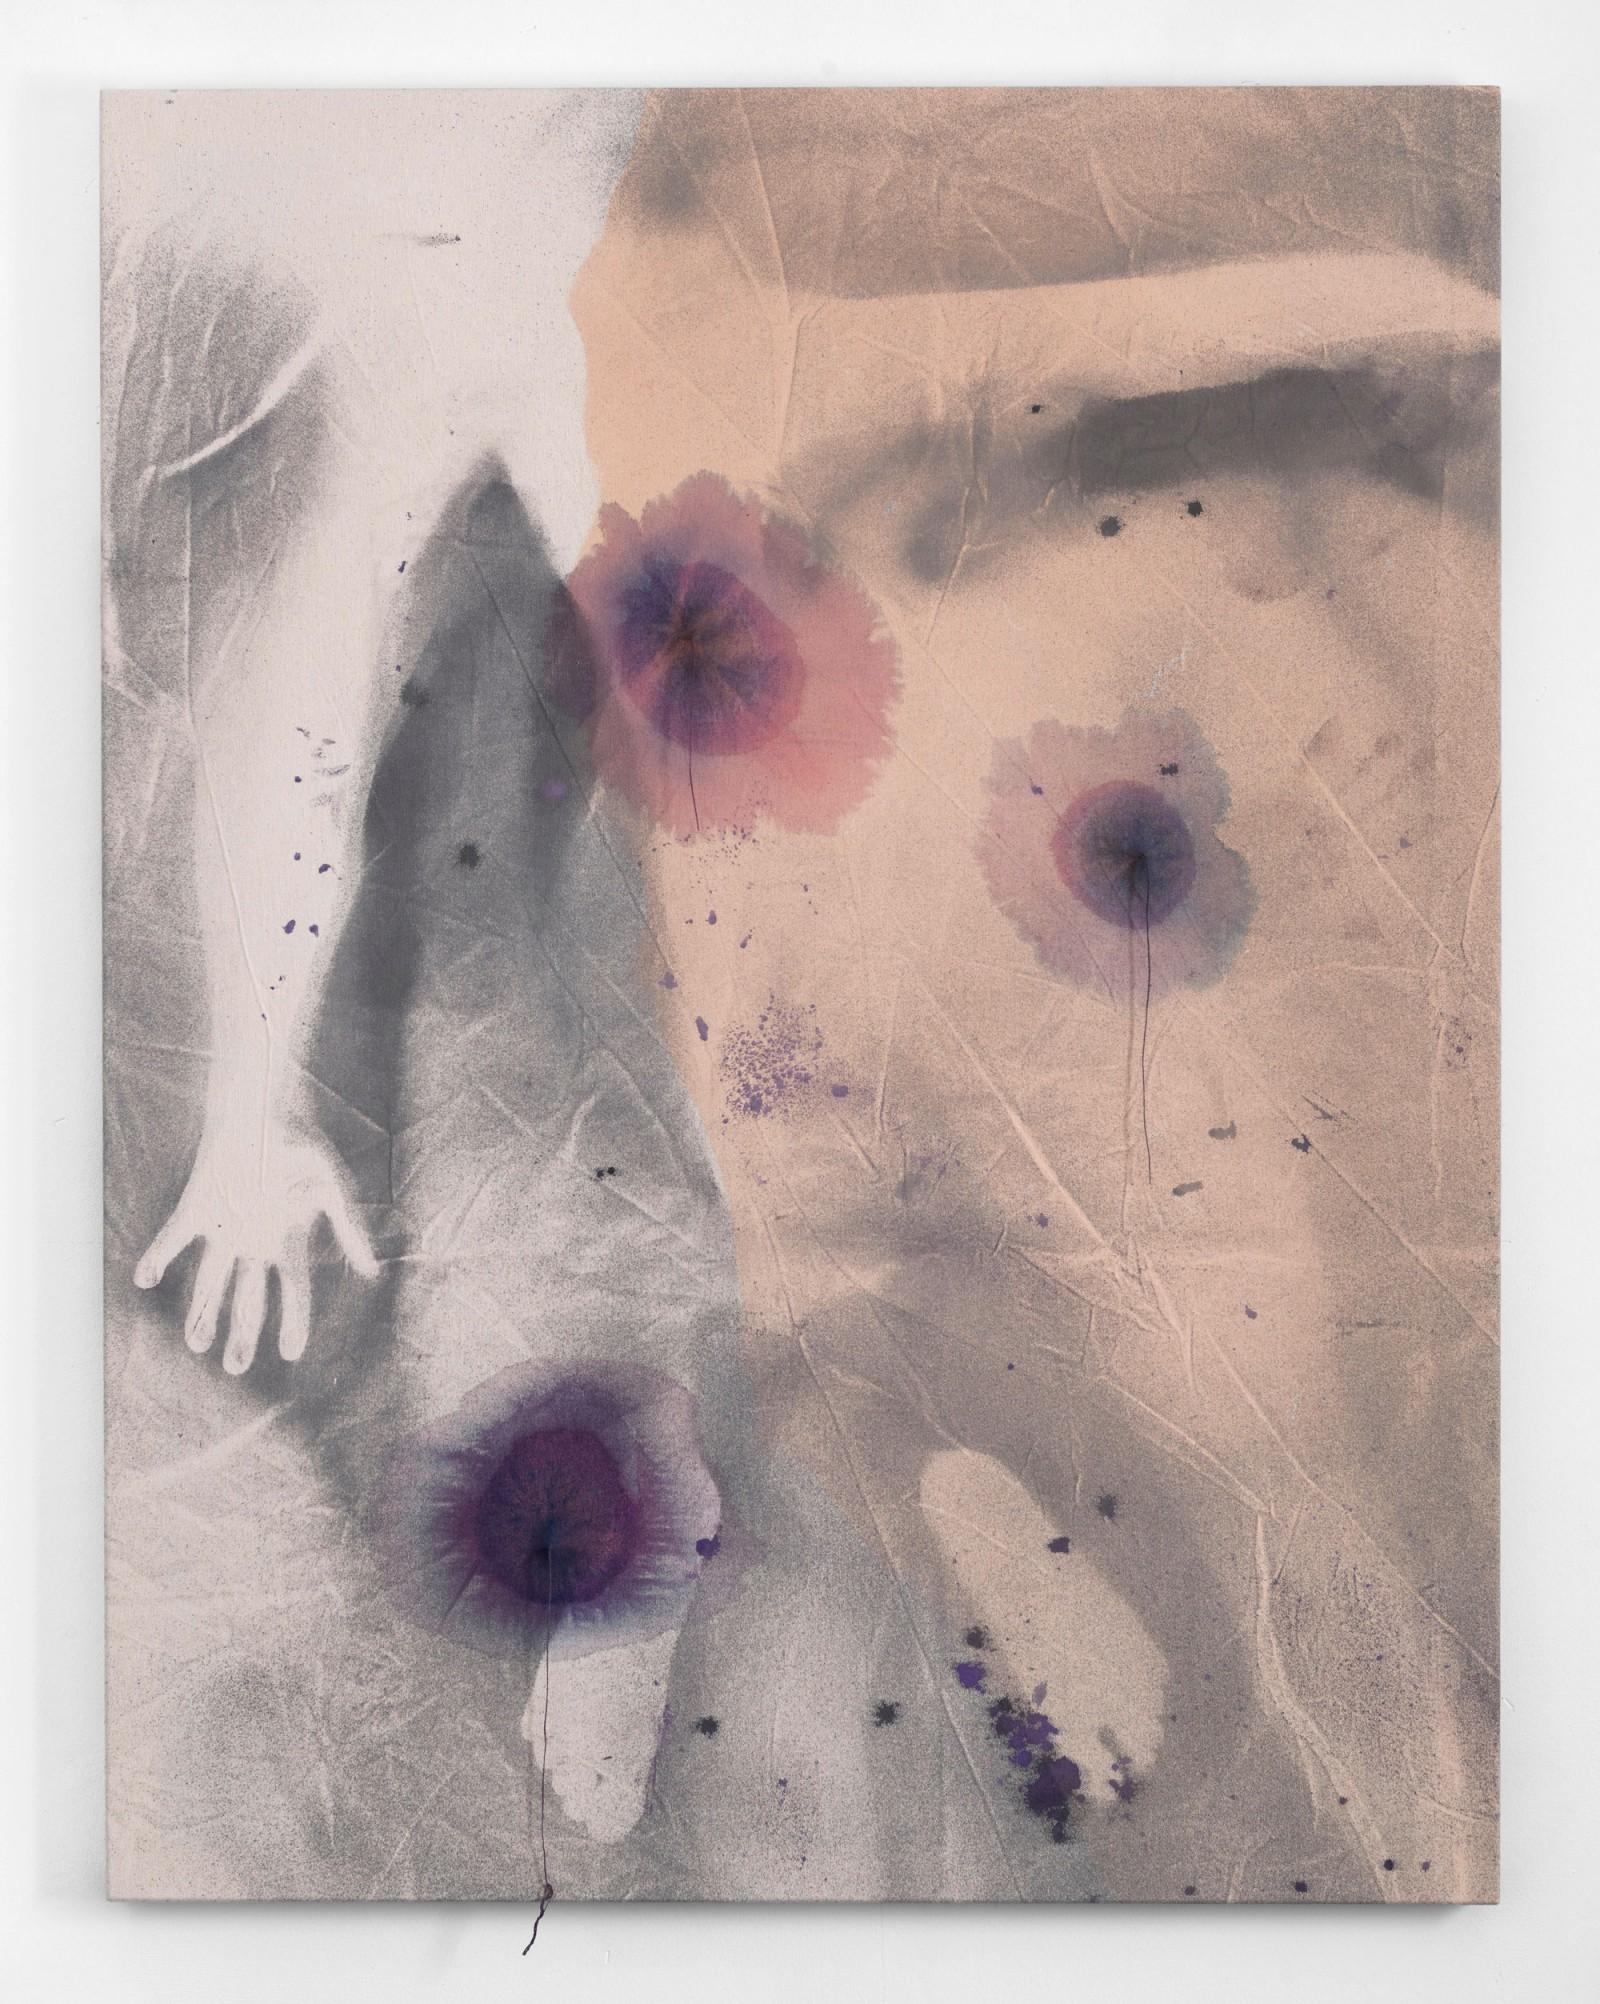 Kim Nekarda: untitled, 2012, vinyl color, thread & body print on cotton, 130 x 100 cm, private collection, berlin